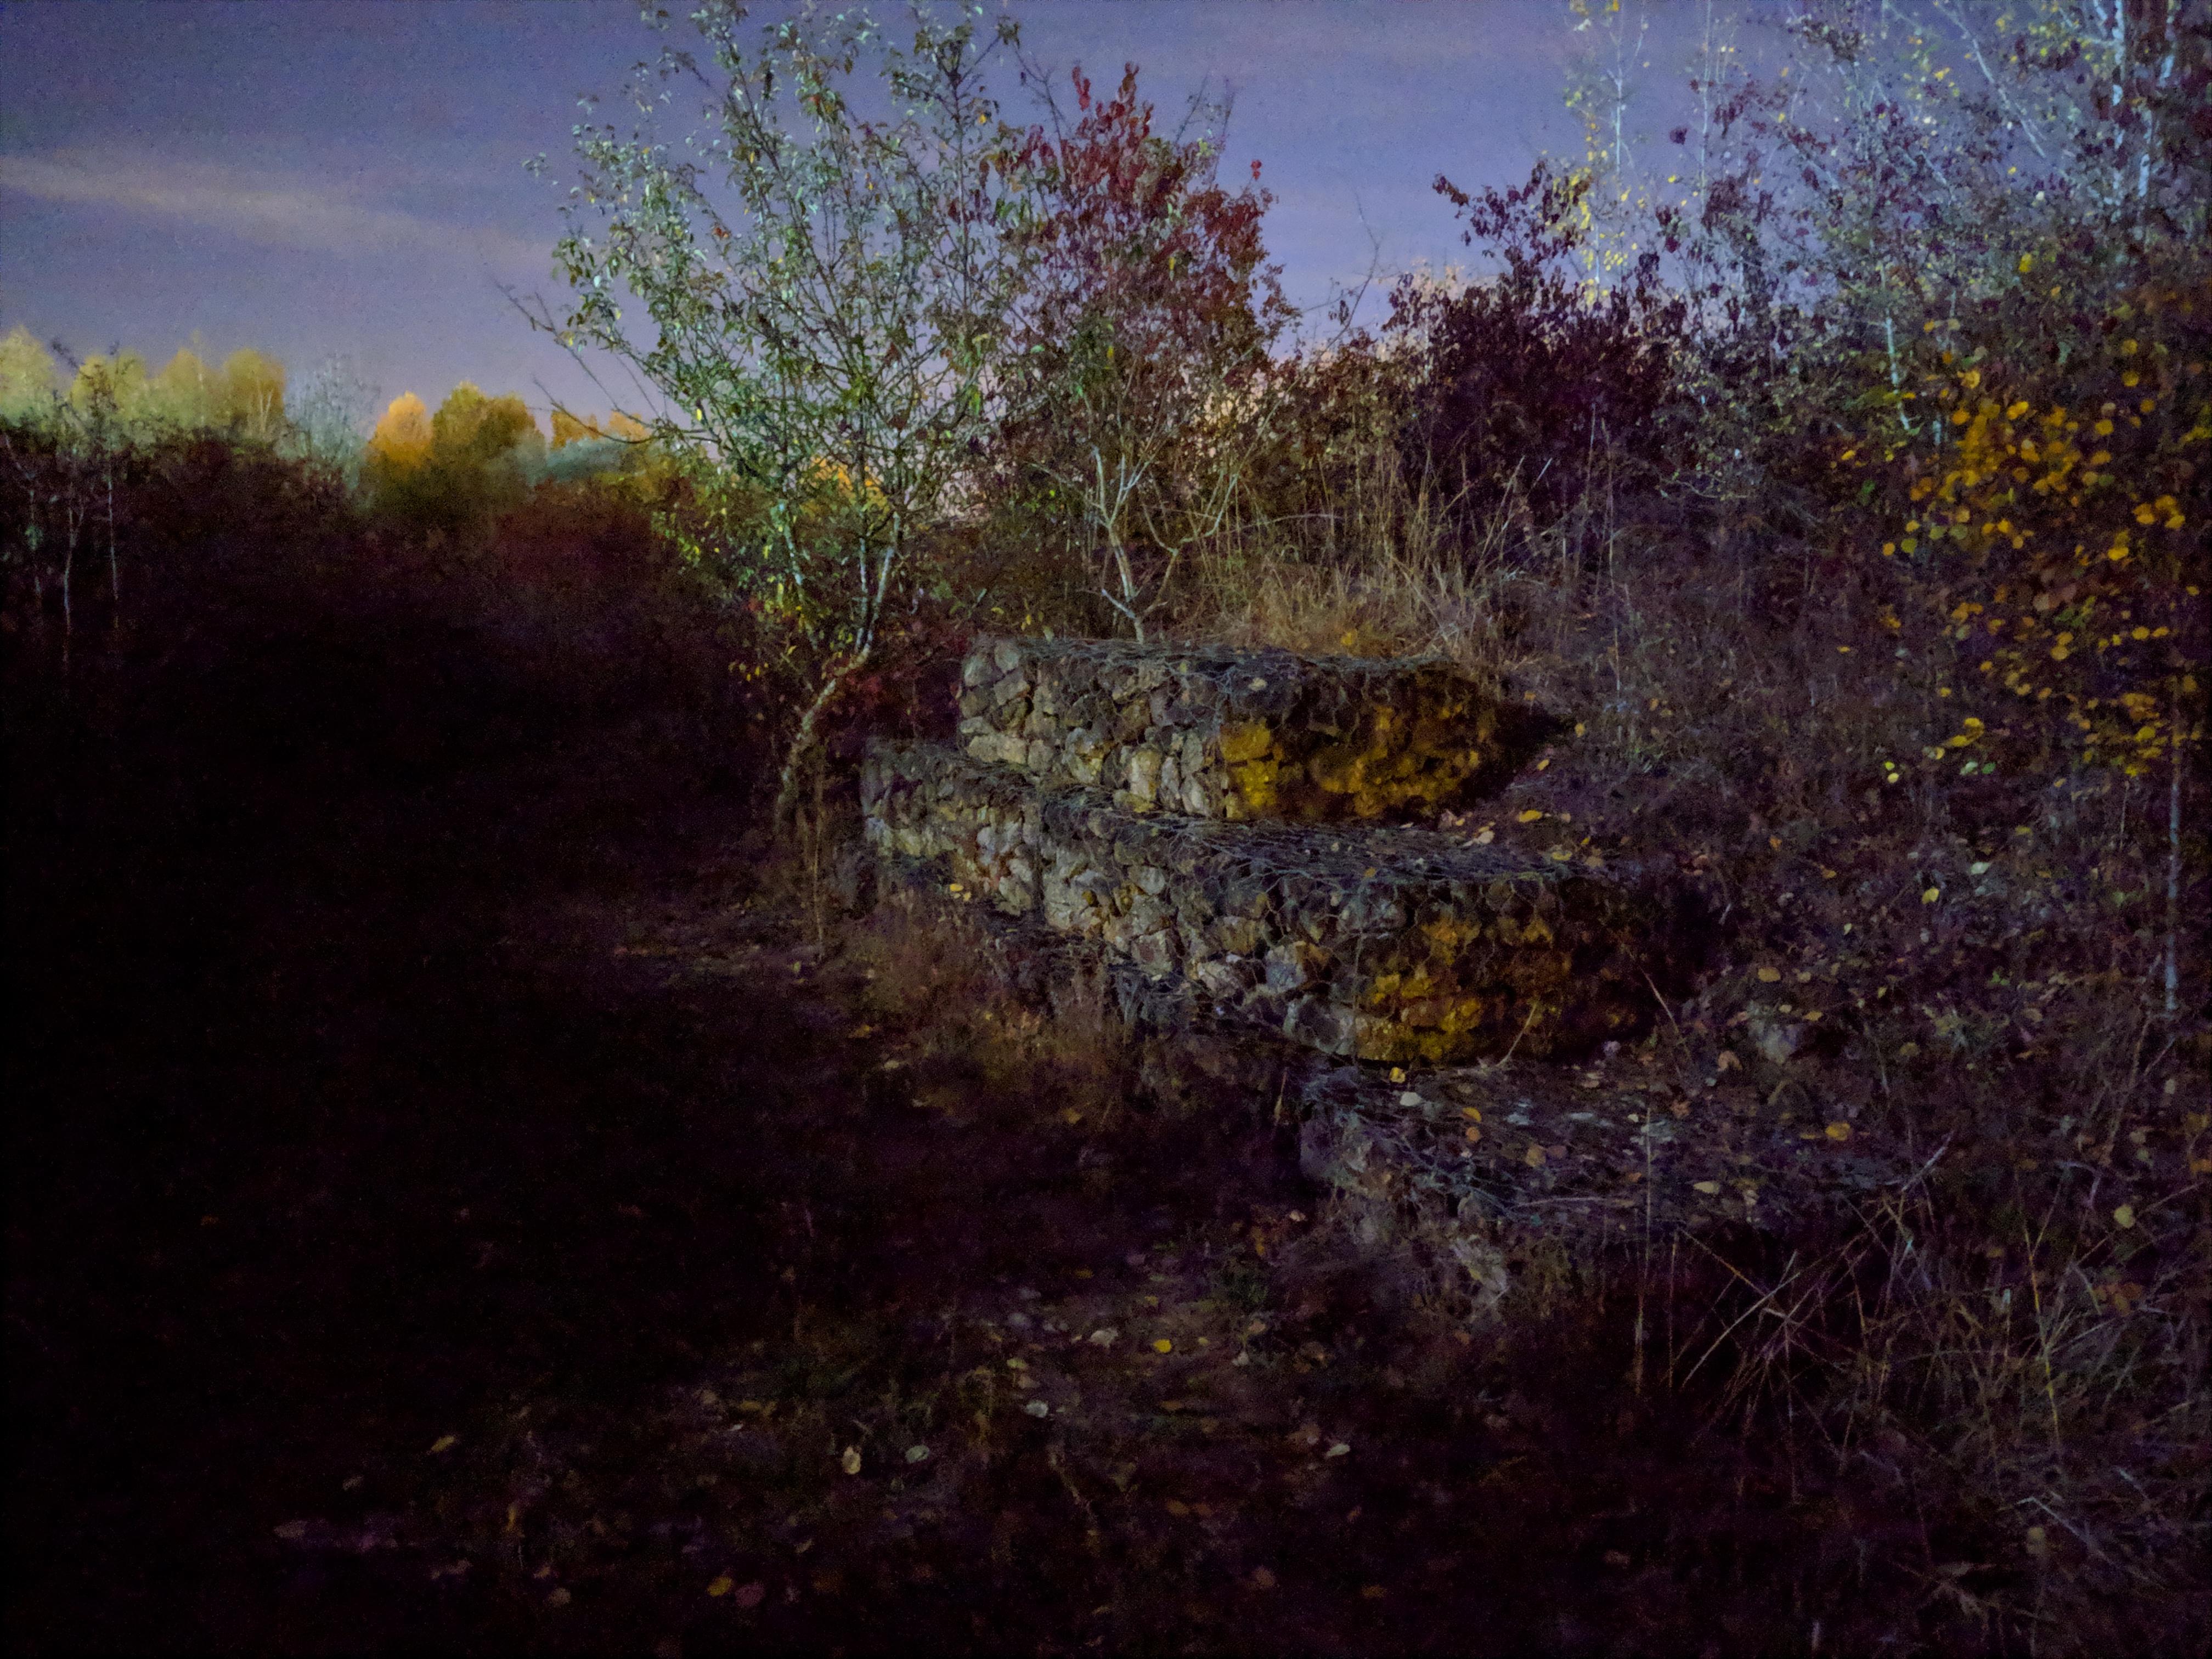 Camera - Low Light Evaluation - Night Sight - The Google Pixel 3